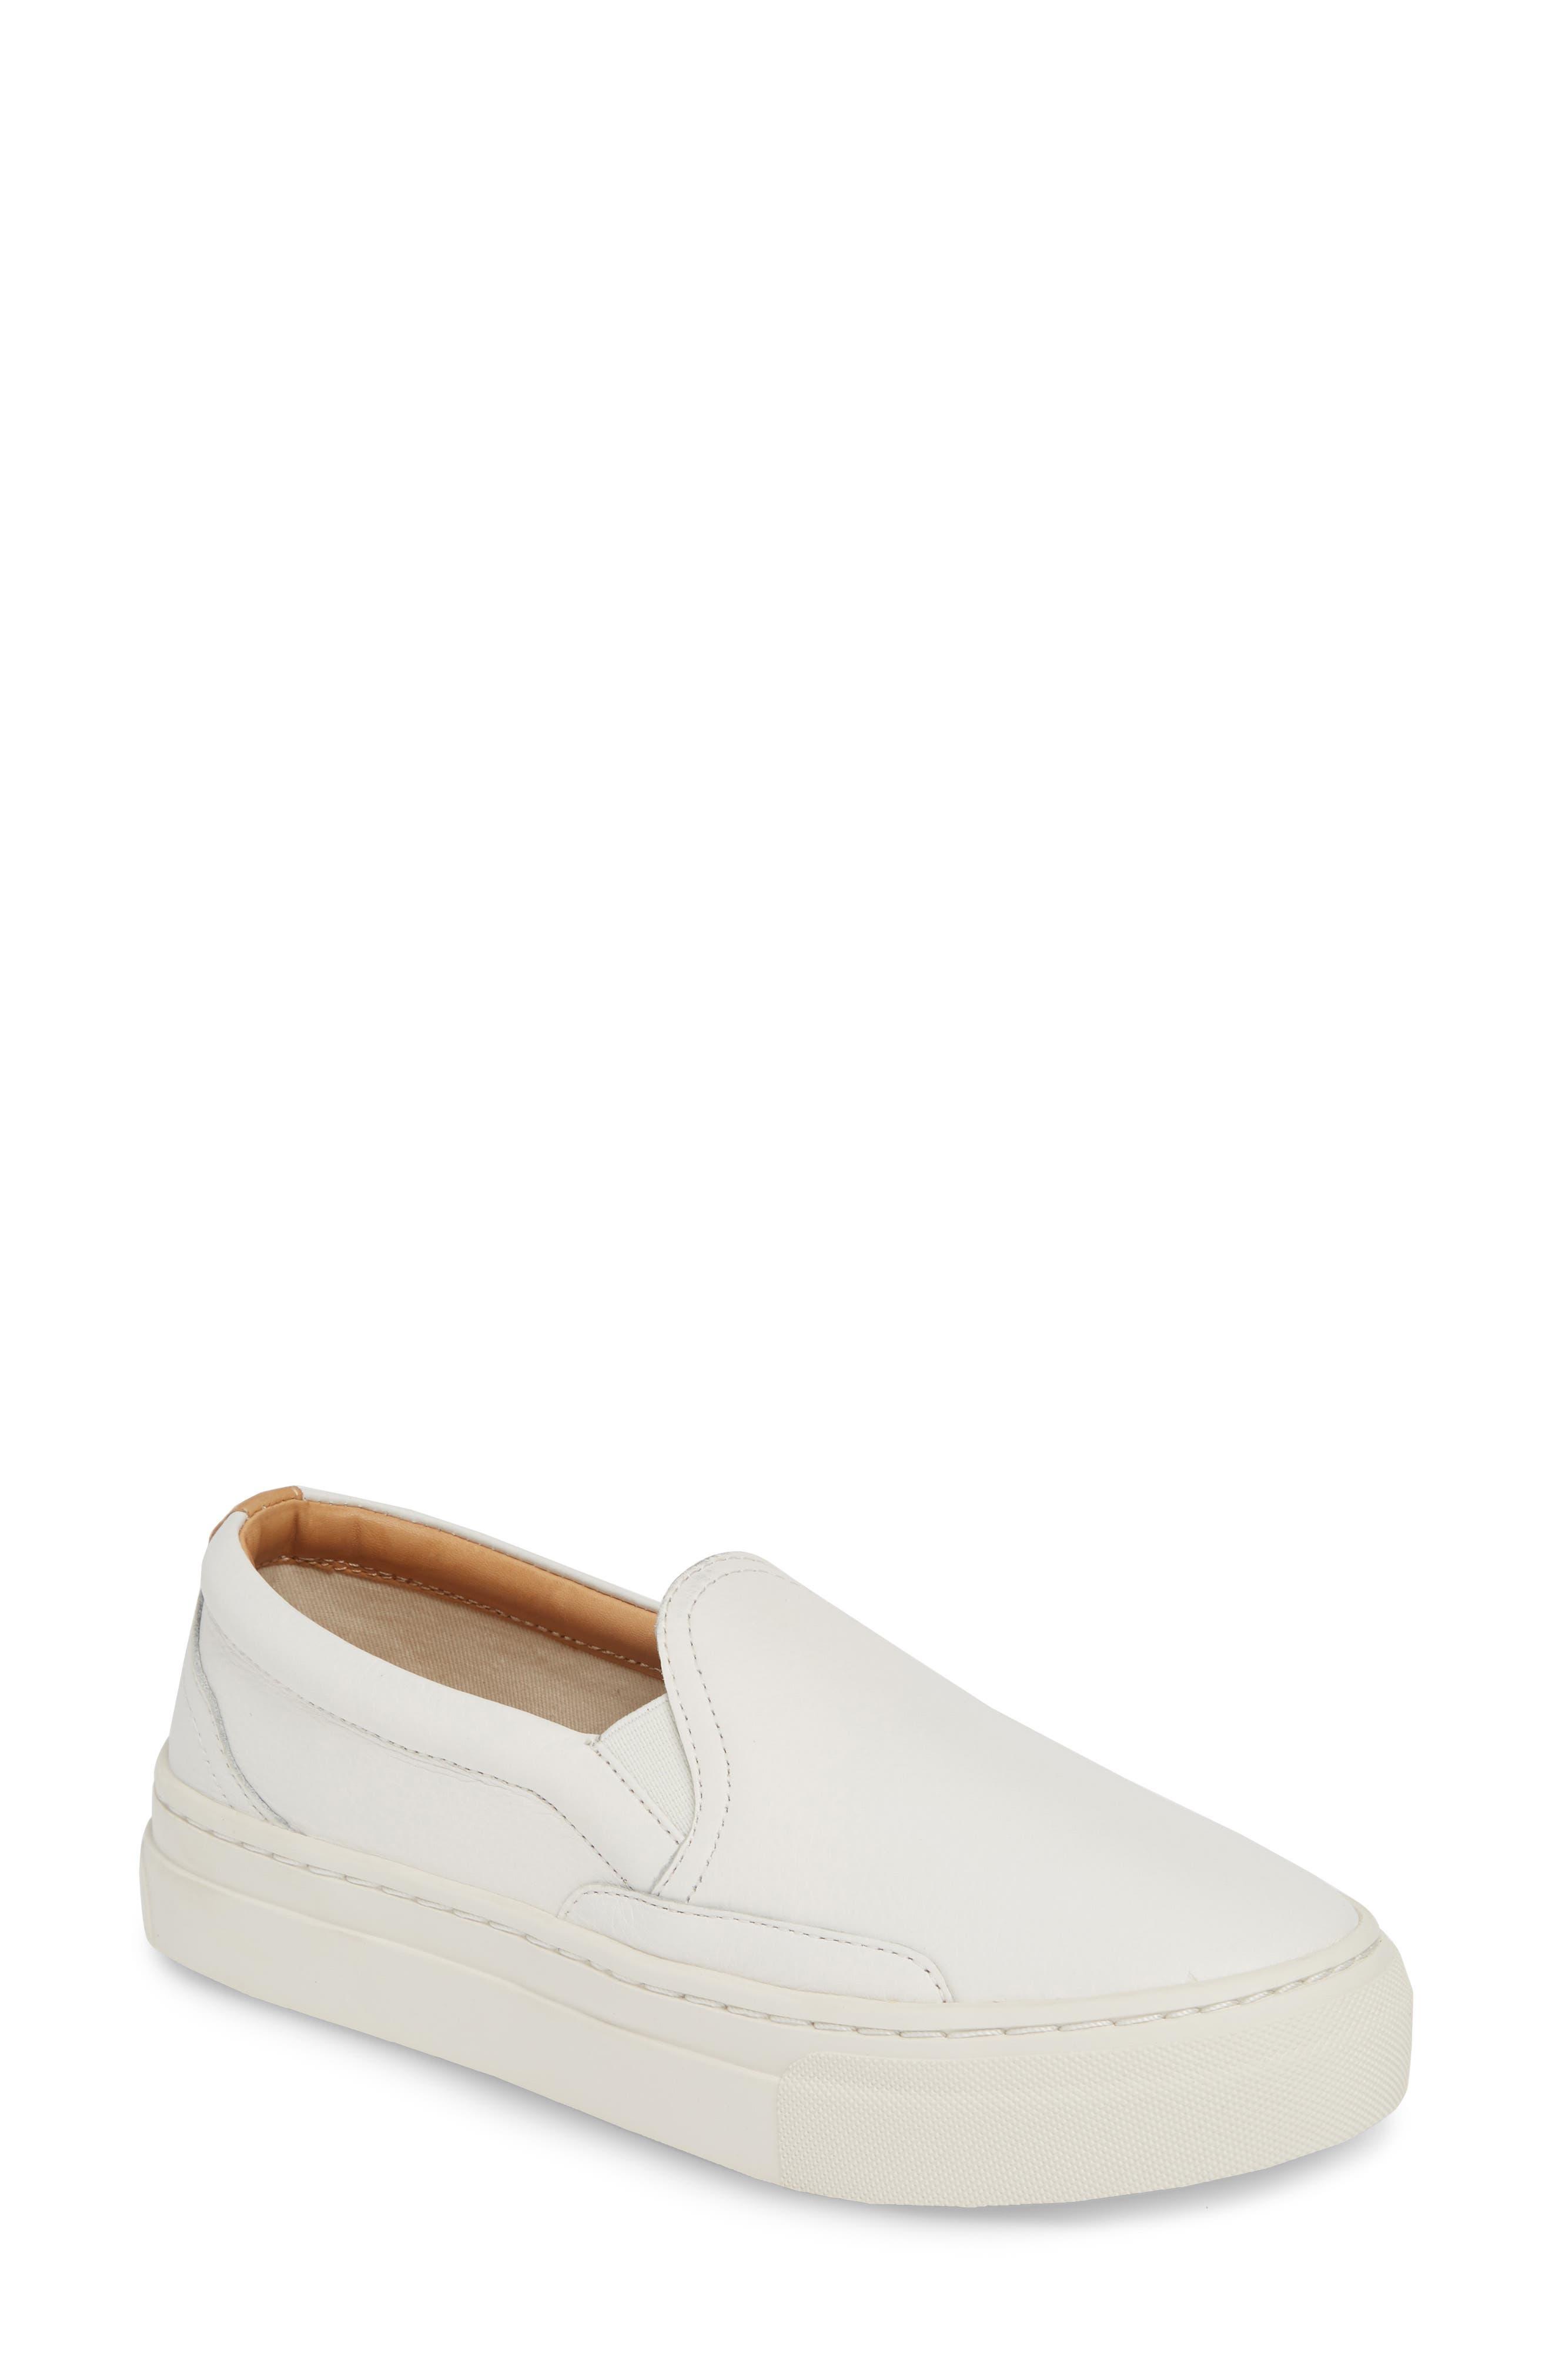 Soludos Bondi Slip-On Sneaker, White